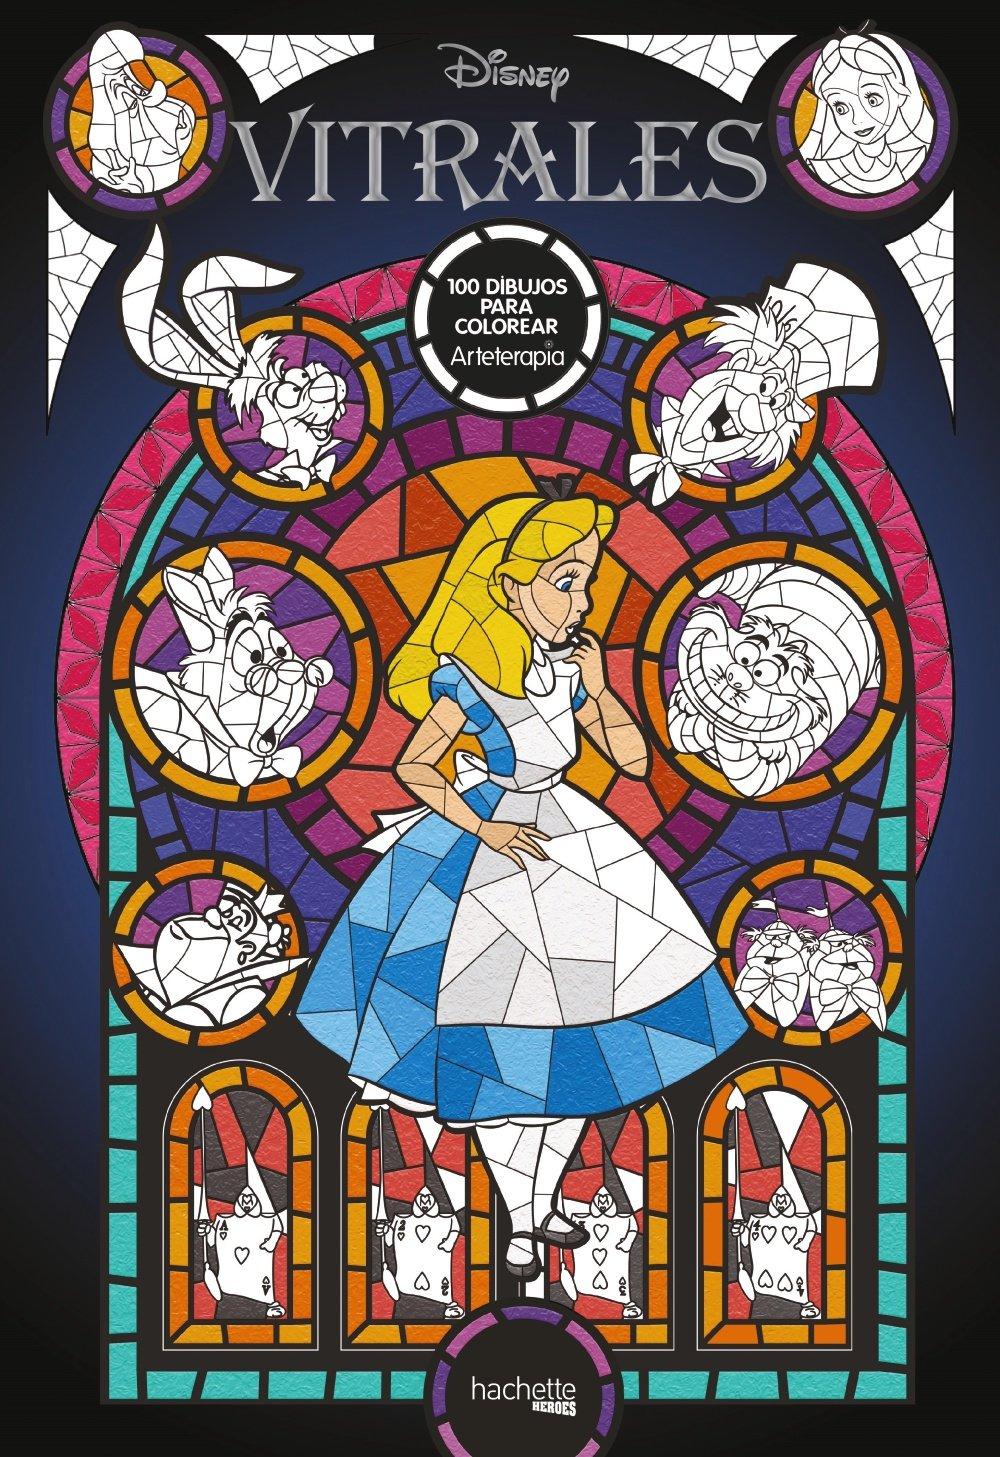 Arteterapia Vitrales Disney Hachette Heroes Disney